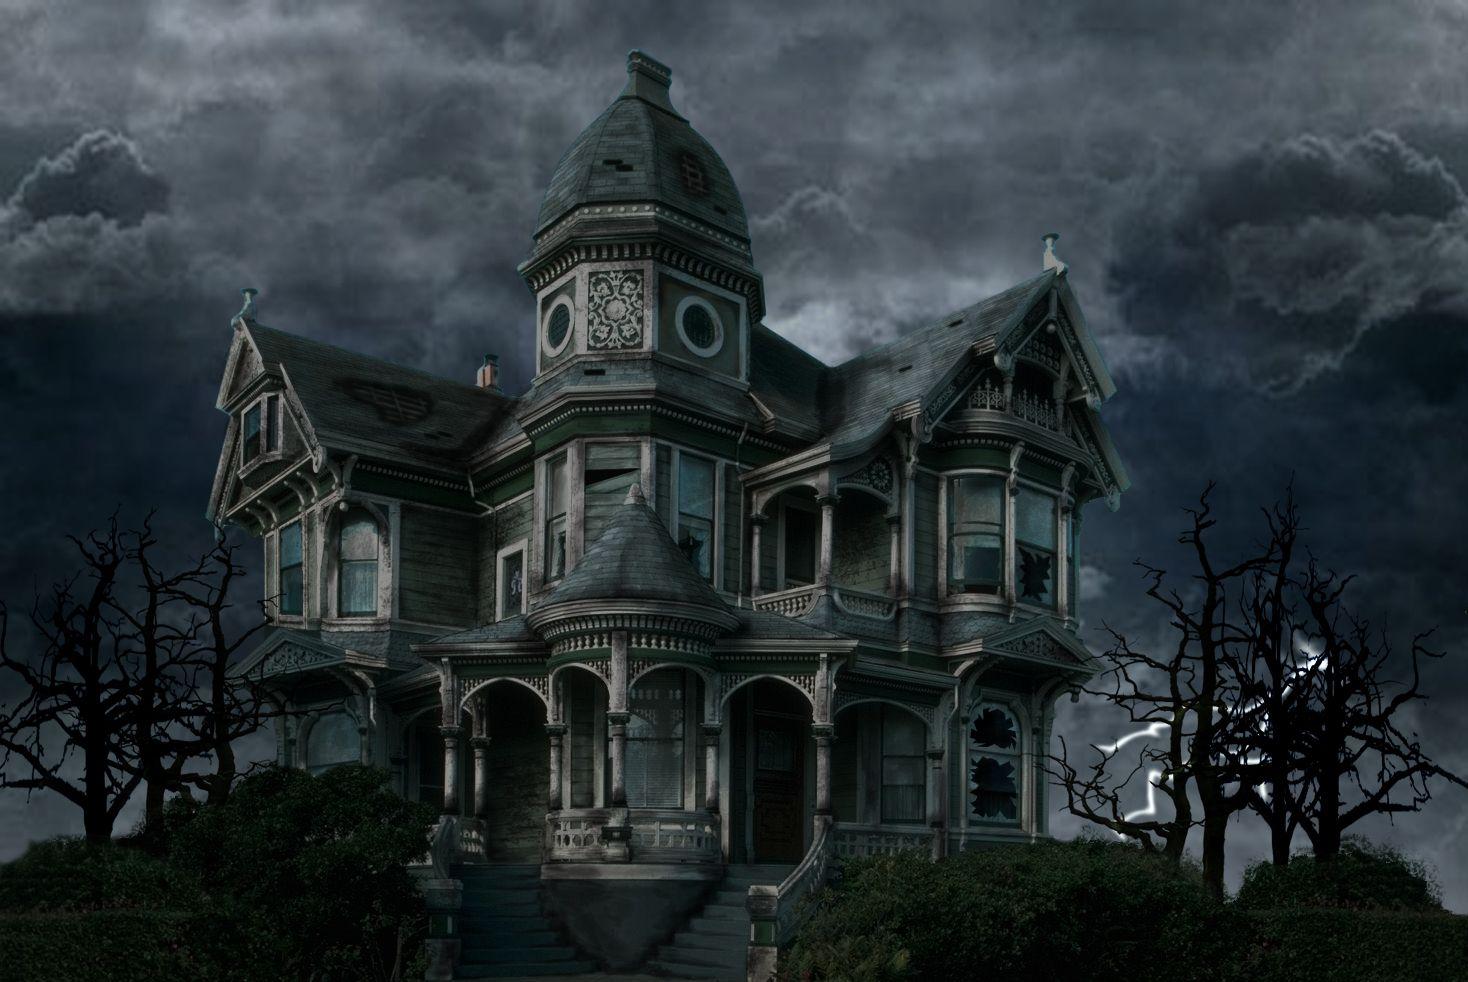 description of a scary house